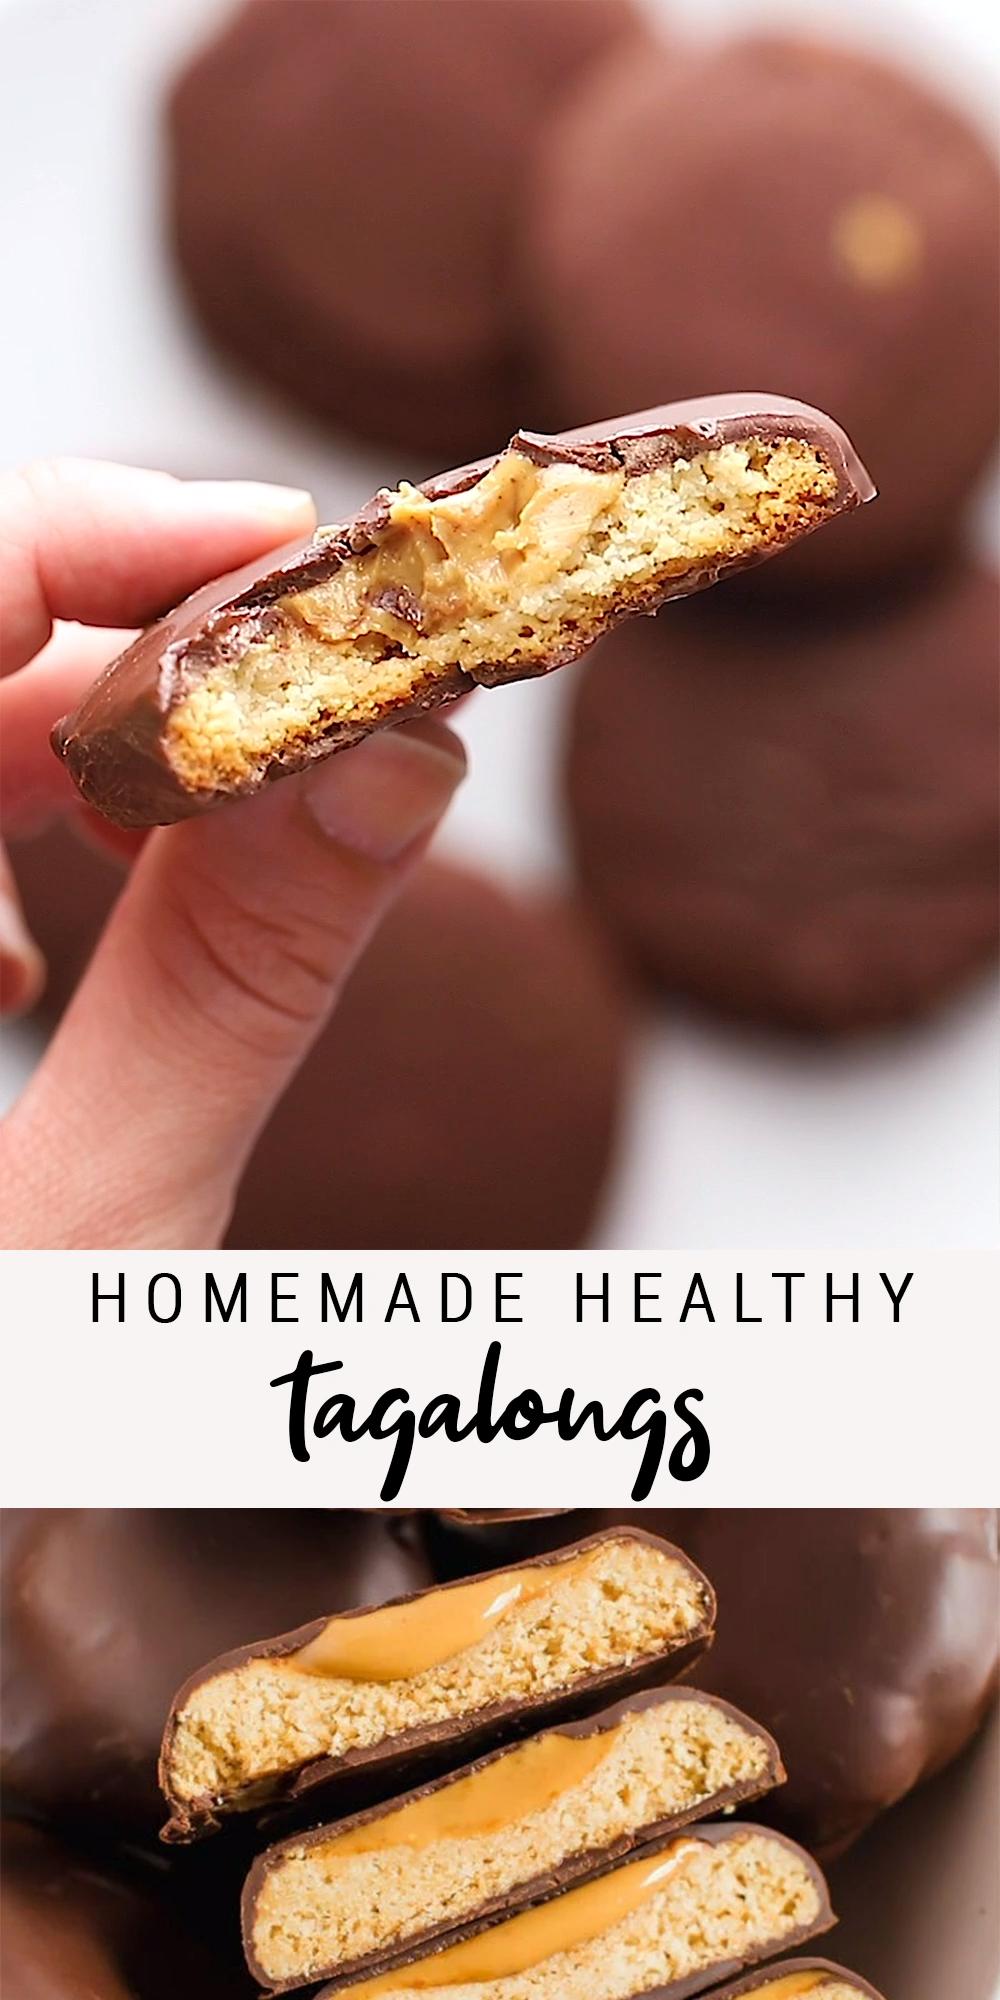 Homemade Healthy Tagalongs | Gluten-Free + Vegan G